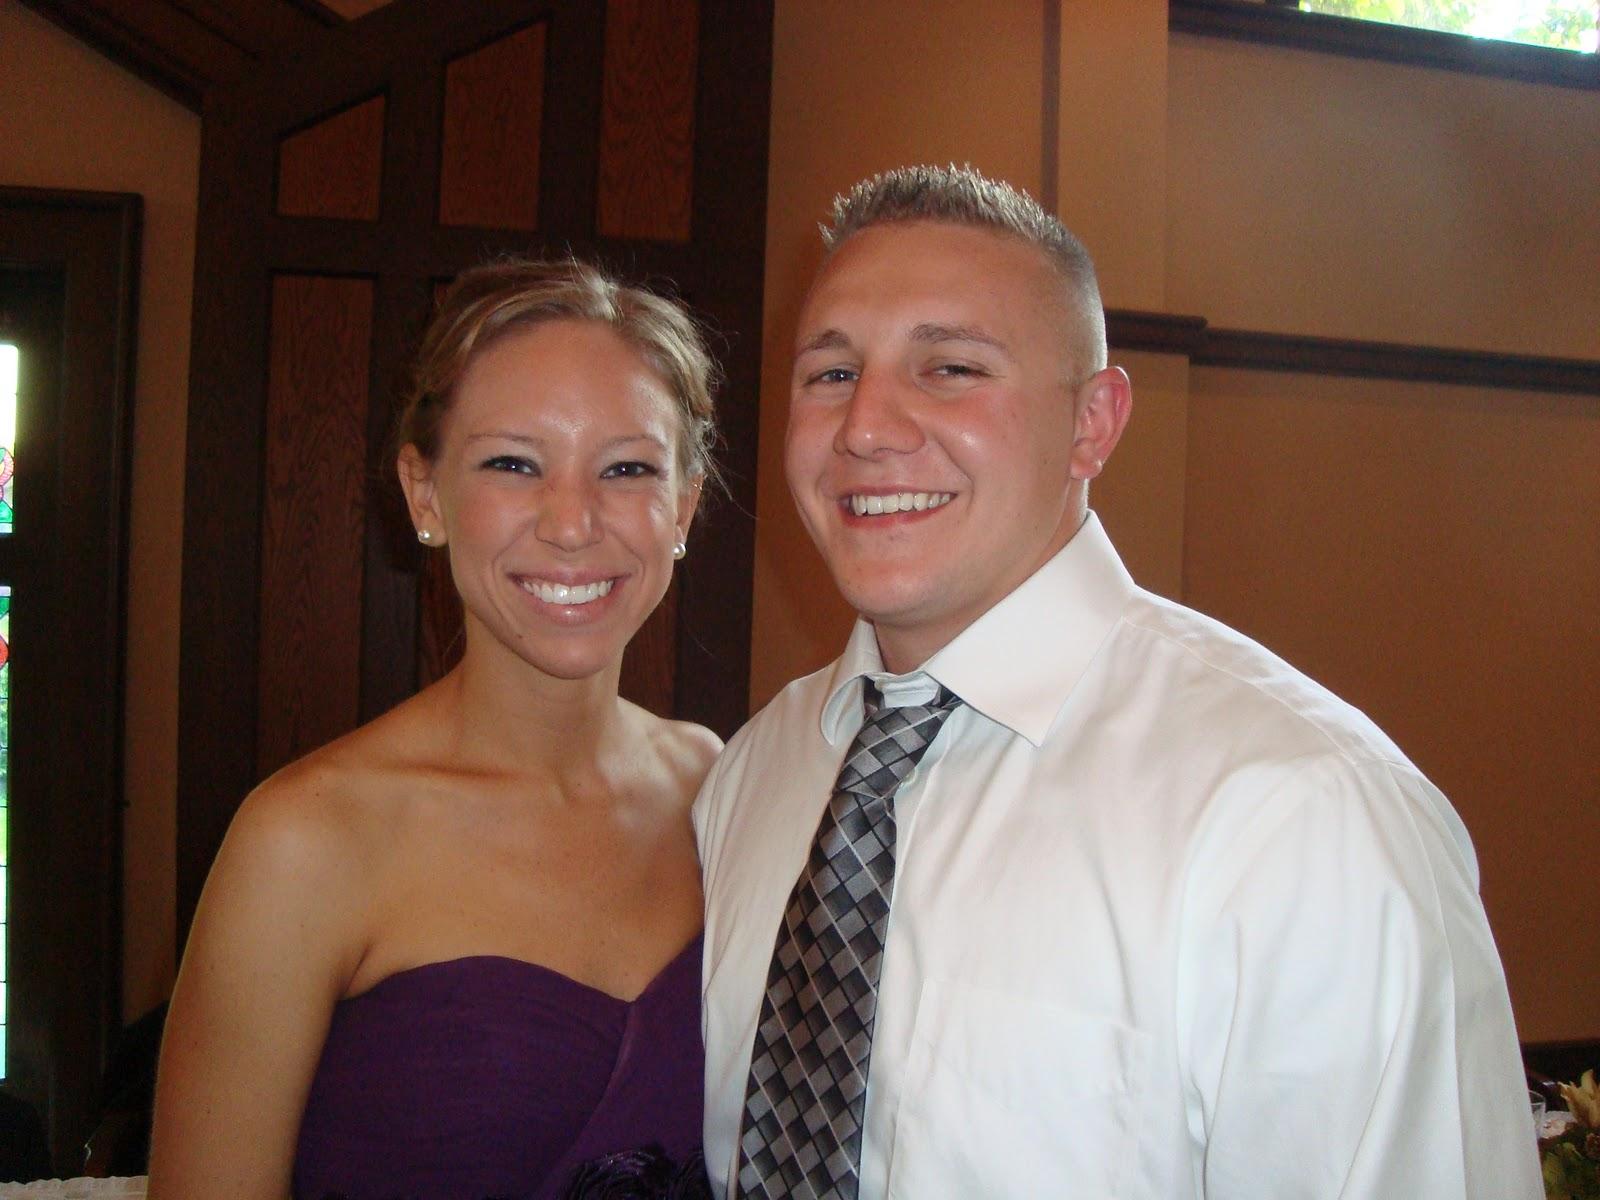 Morgan yoder wedding